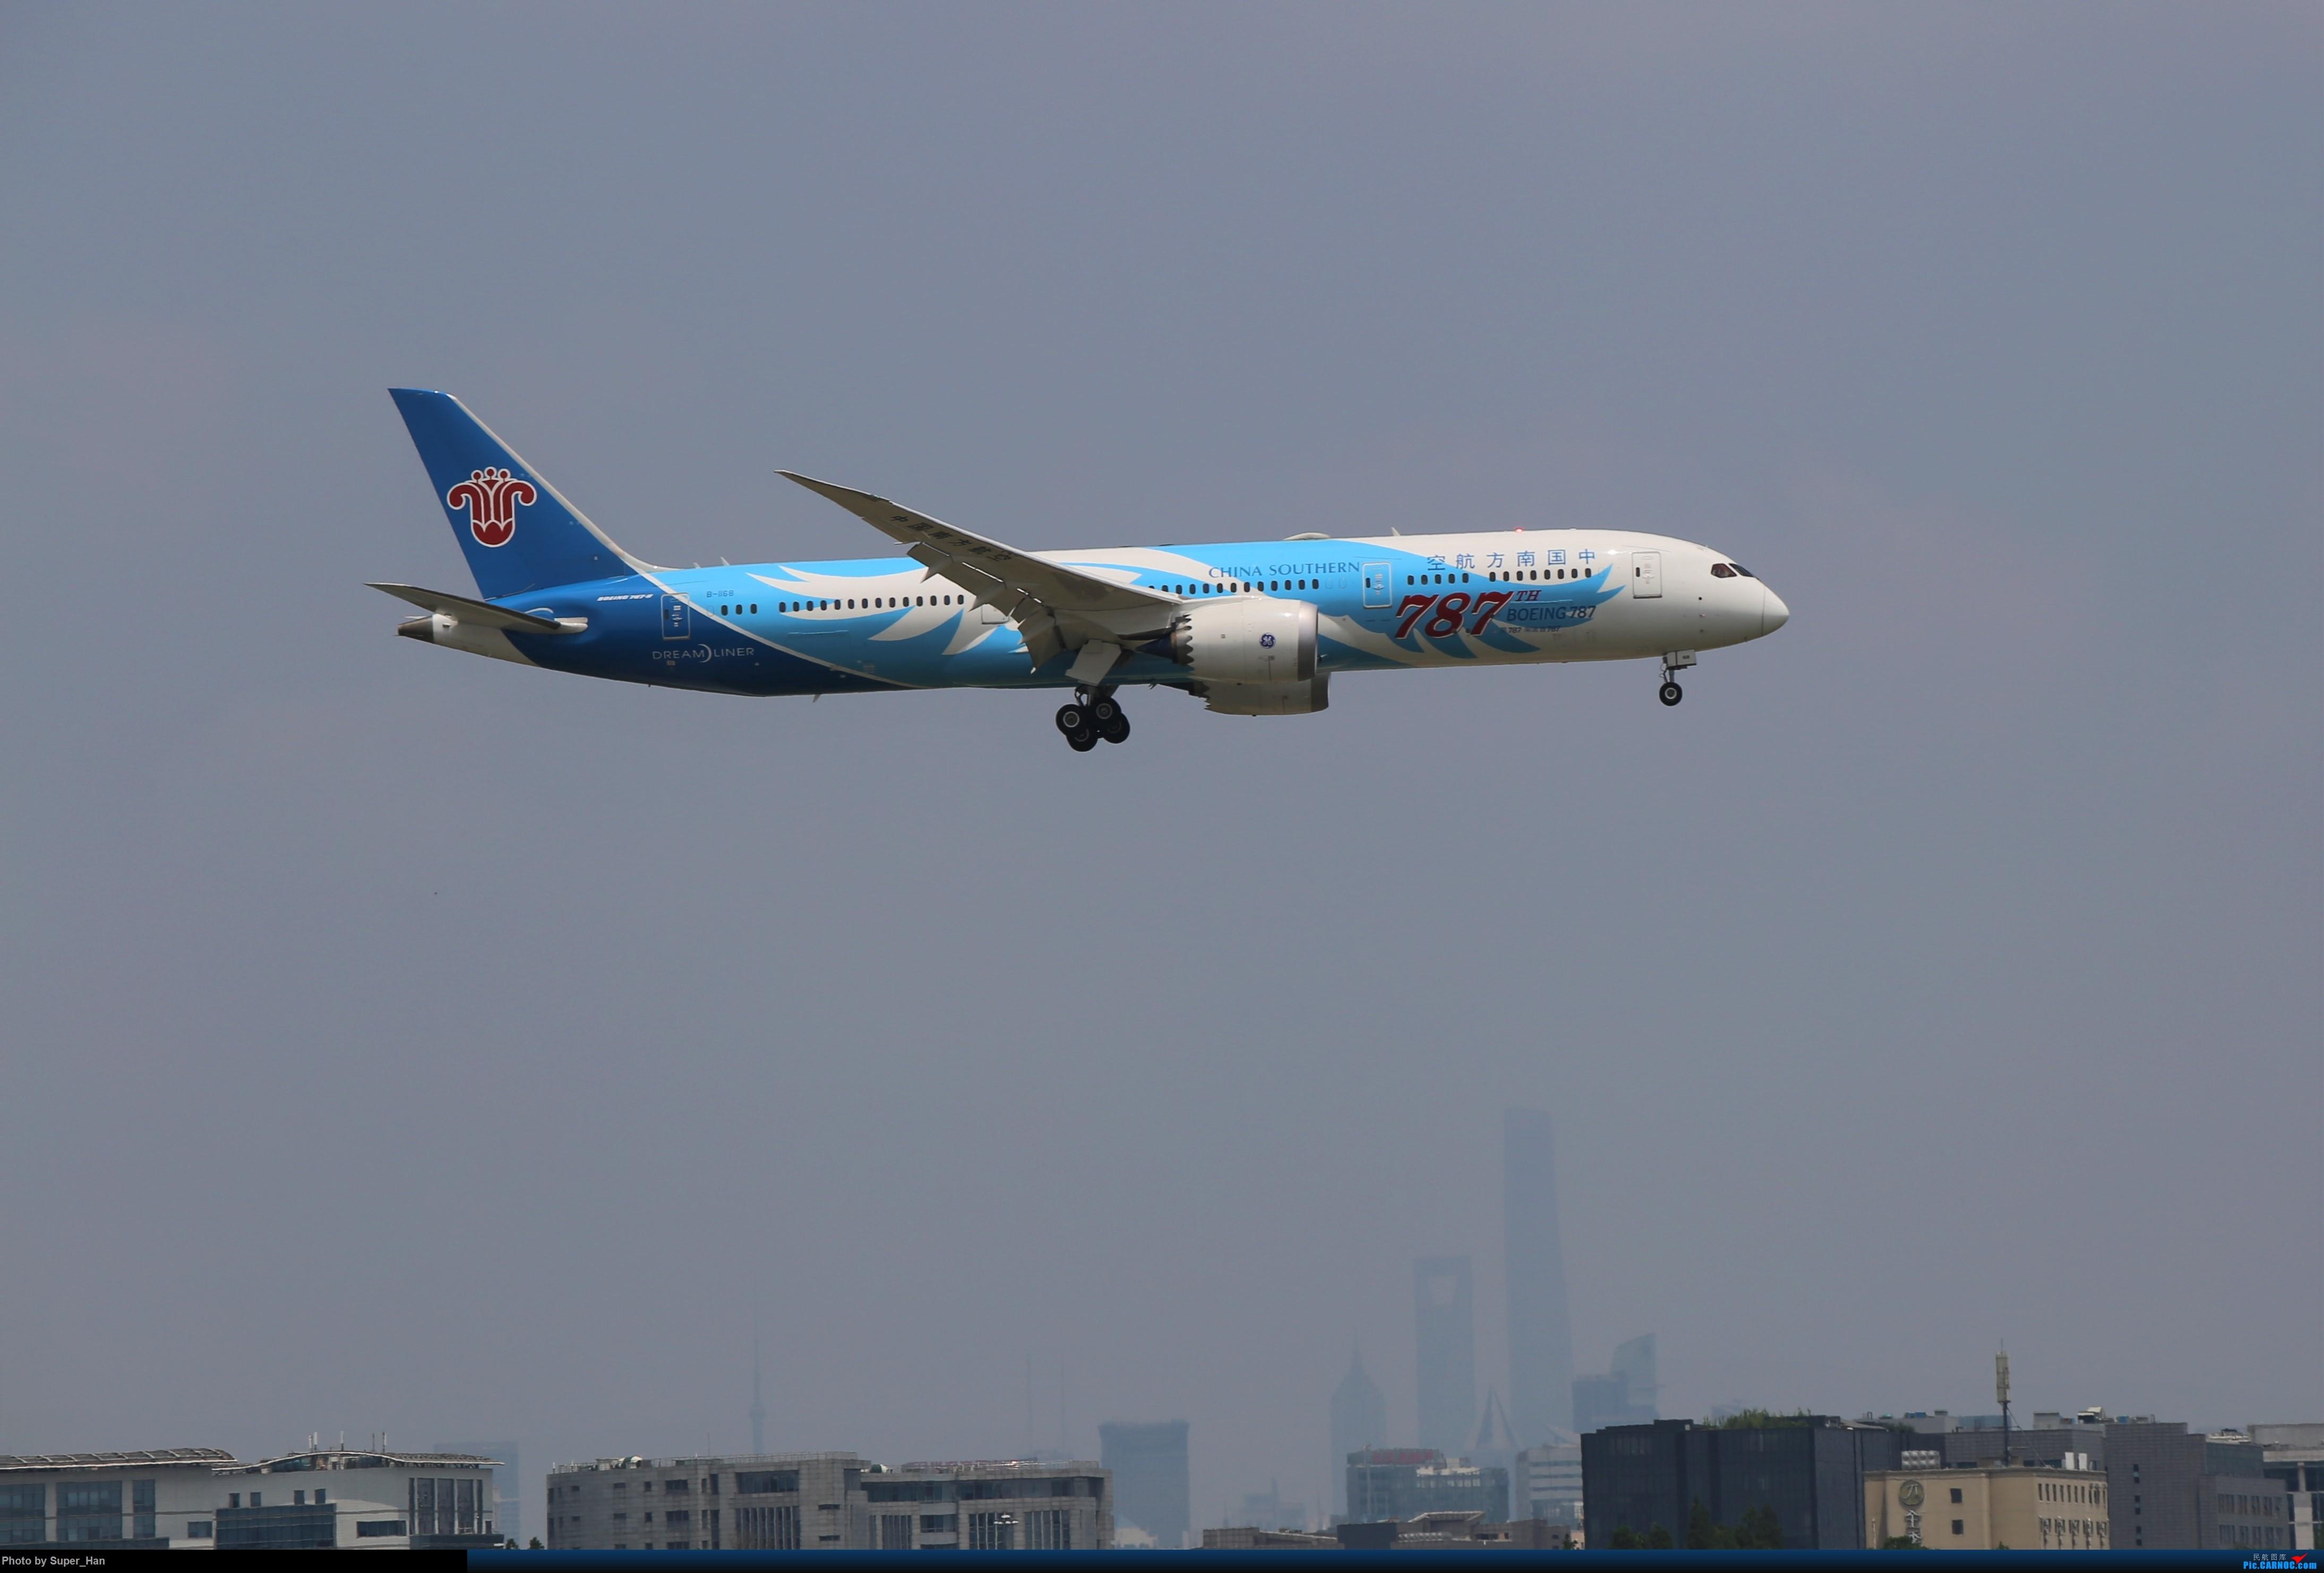 Re:[原创]【杭州飞友会】浦东之上 BOEING 787-9 B-1168 中国上海虹桥国际机场